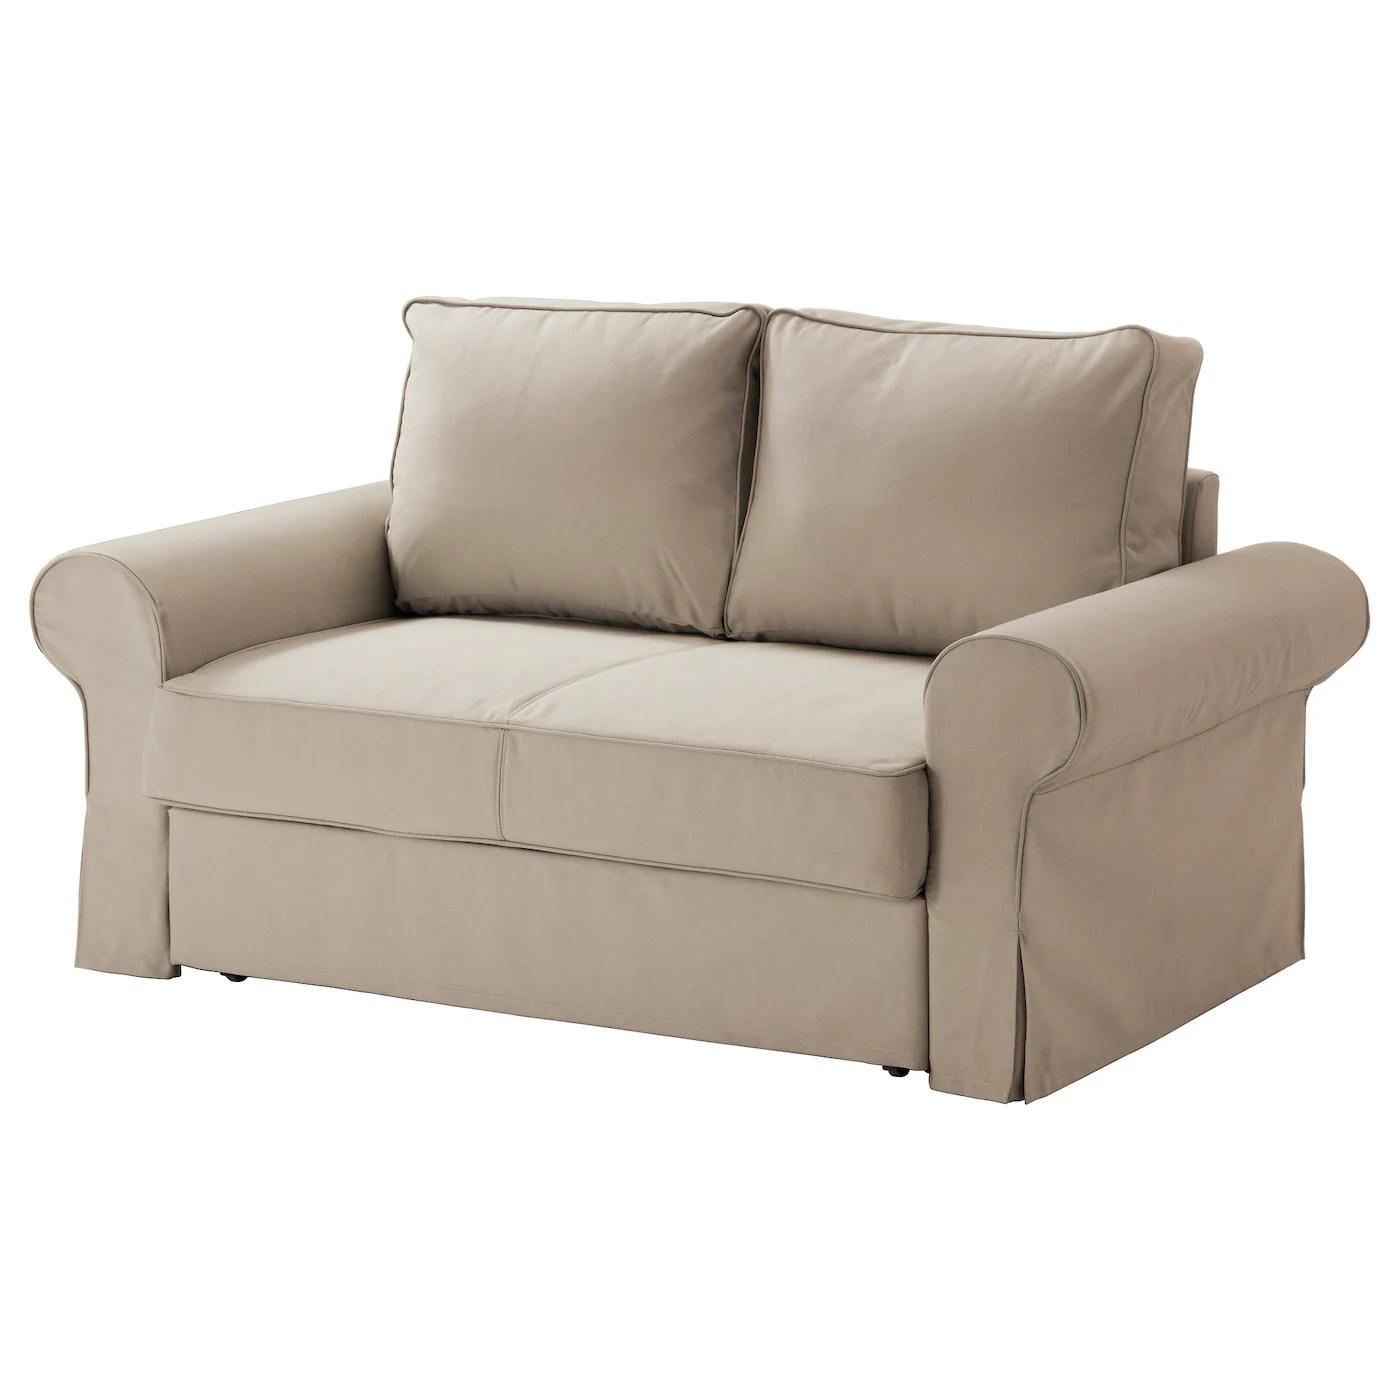 sofa chair bed ikea folding dining beds ireland dublin